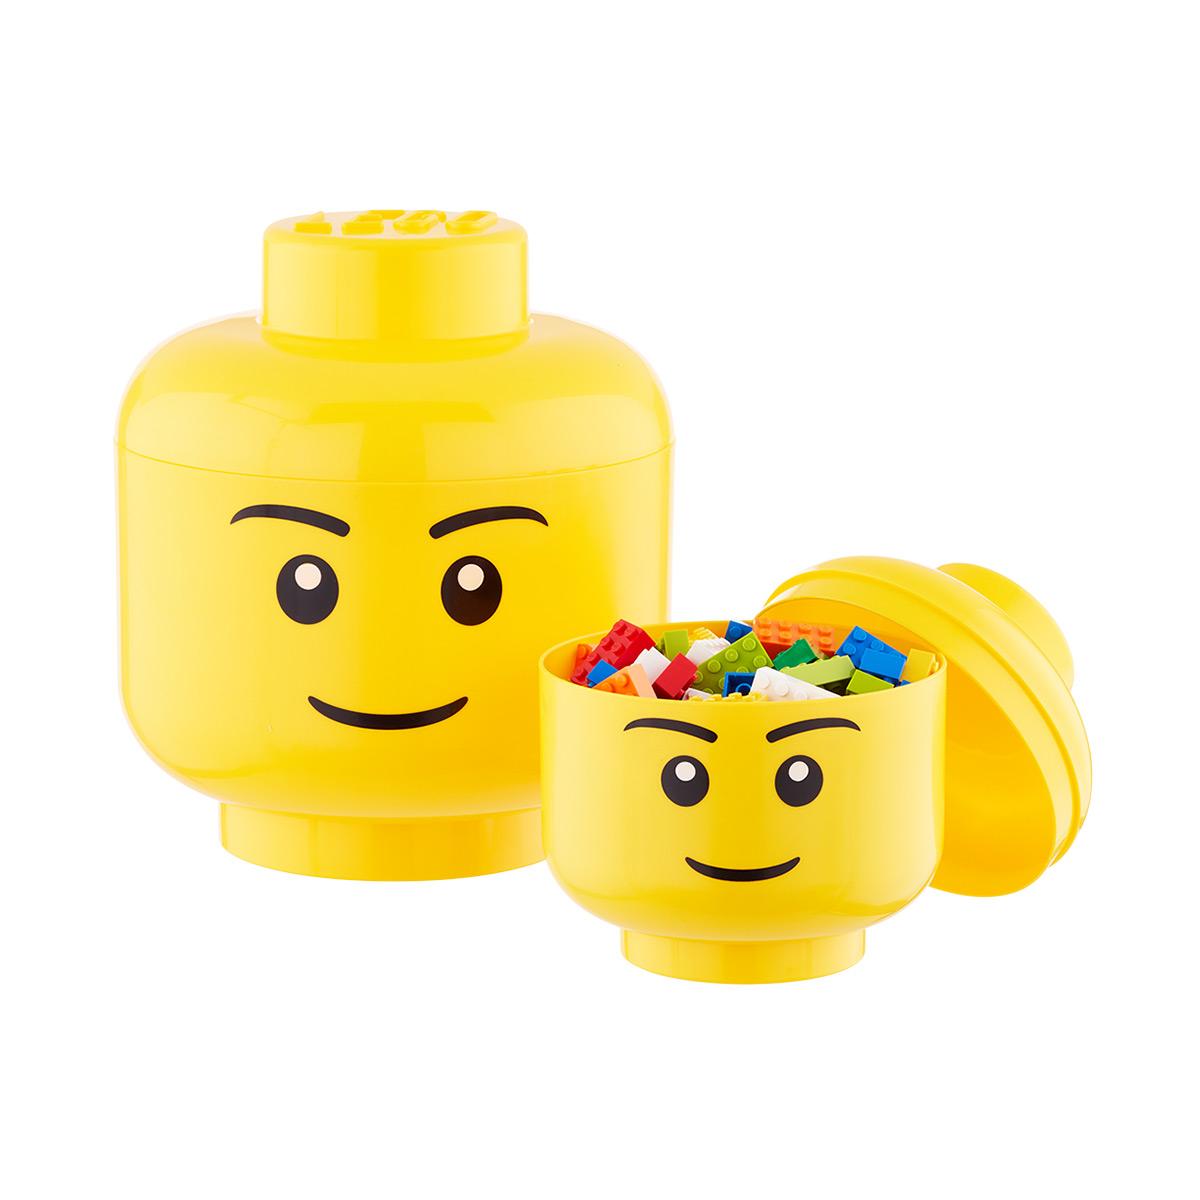 Lego sorter head